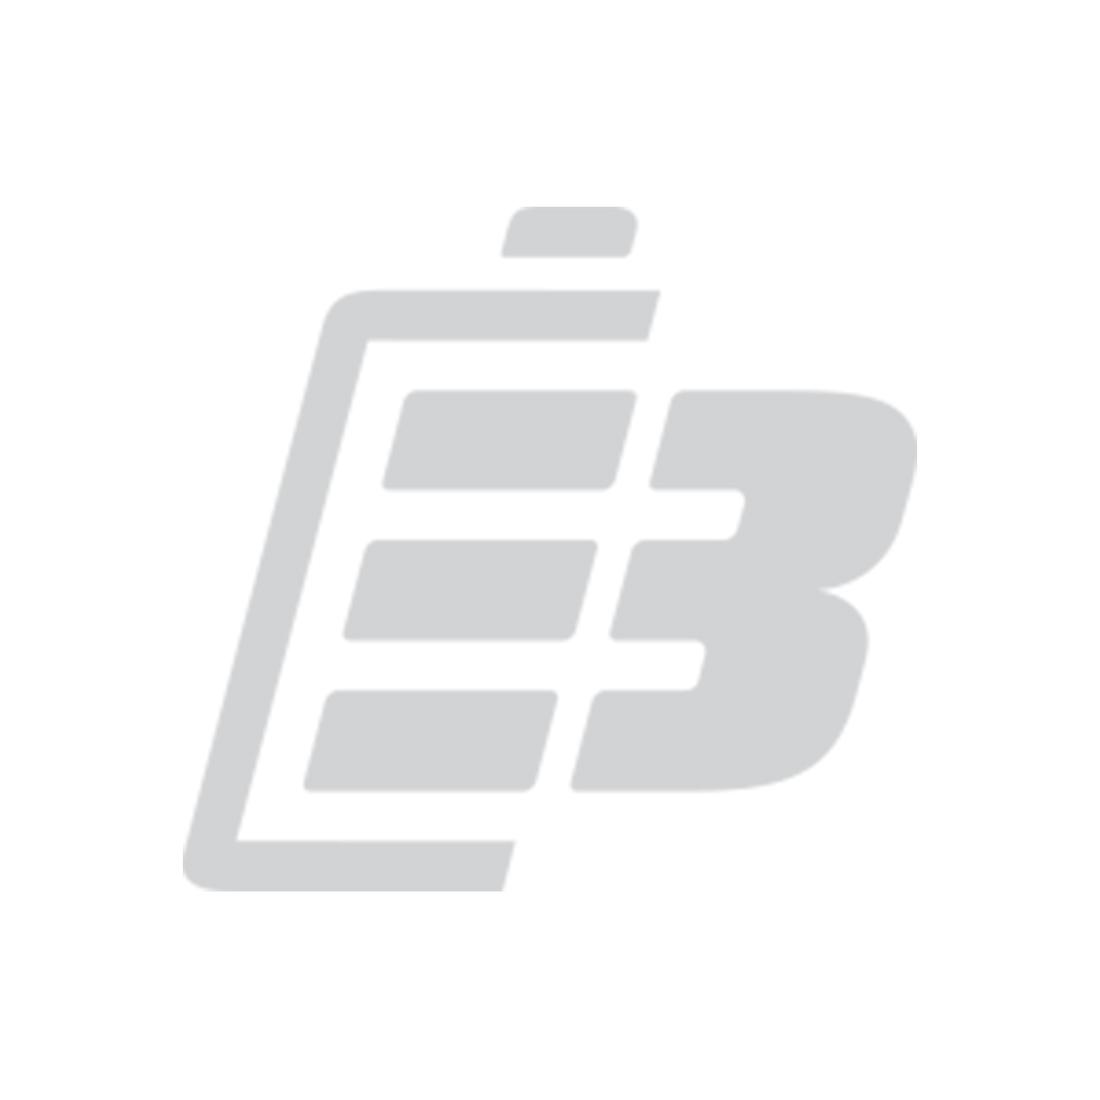 MP3 battery Creative Zen Touch 40GB_1